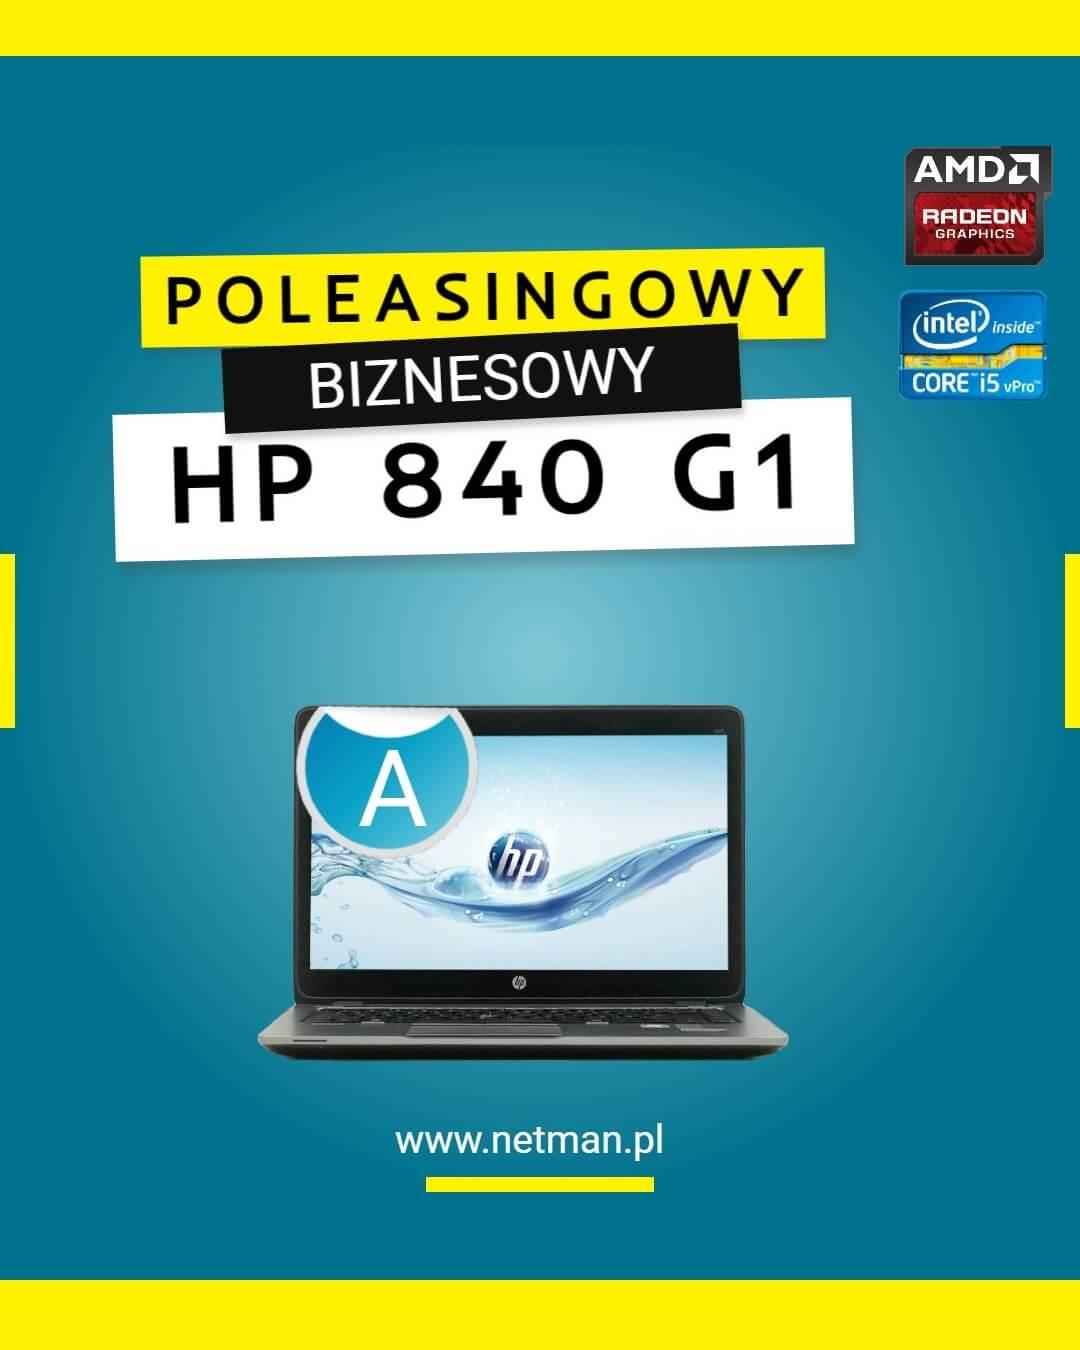 HP 840 G1